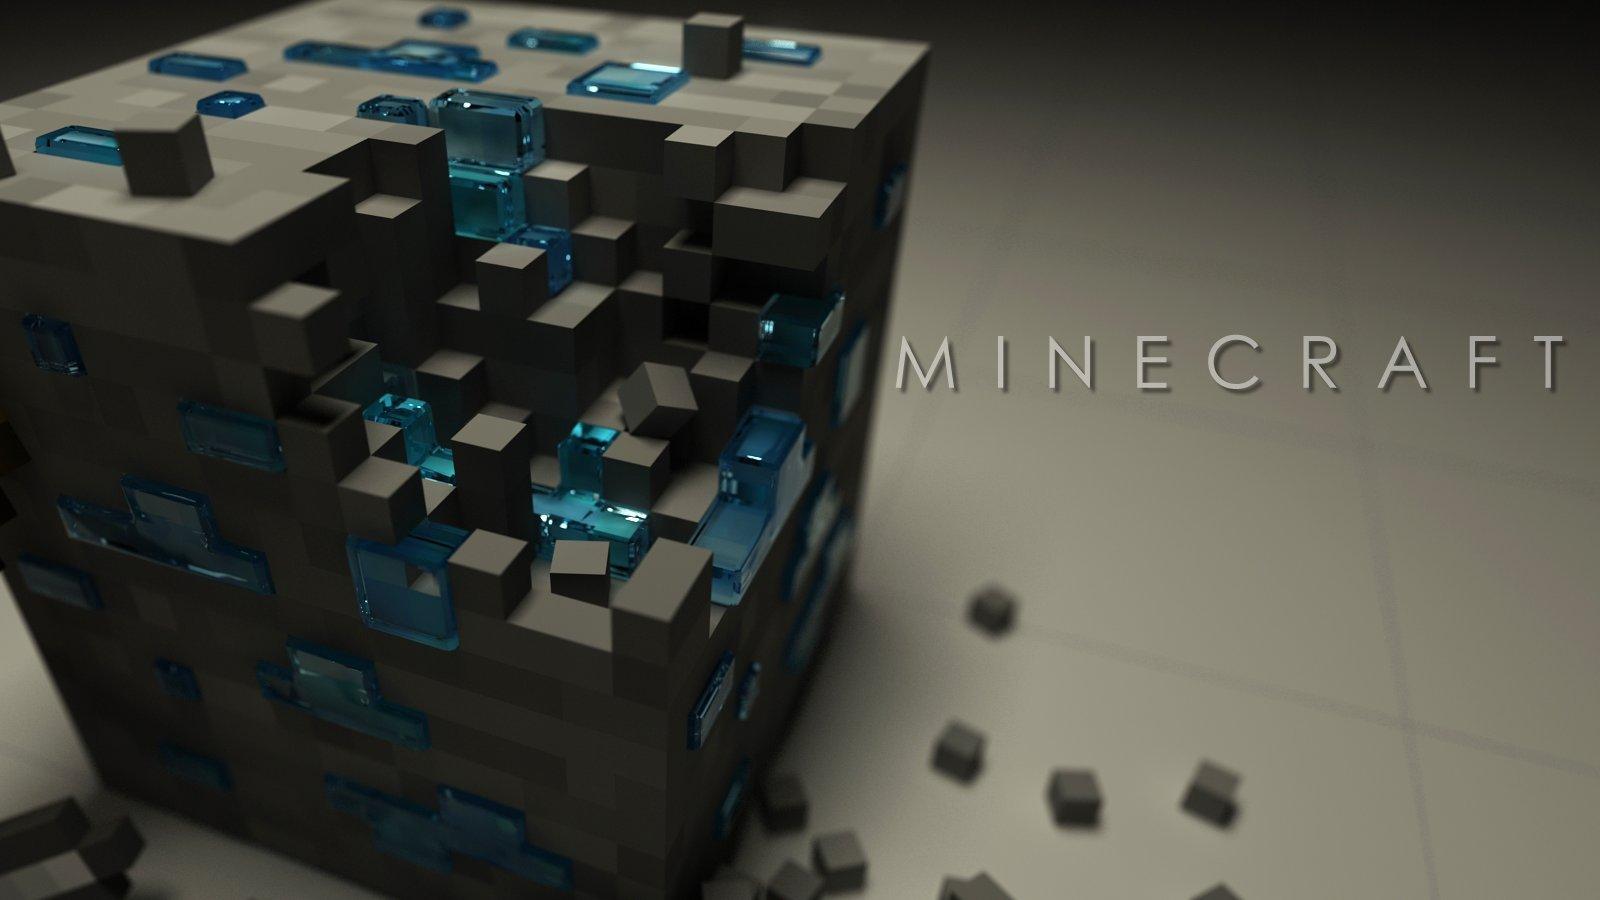 Minecraft Desktop Wallpaper Hd Sf Wallpaper